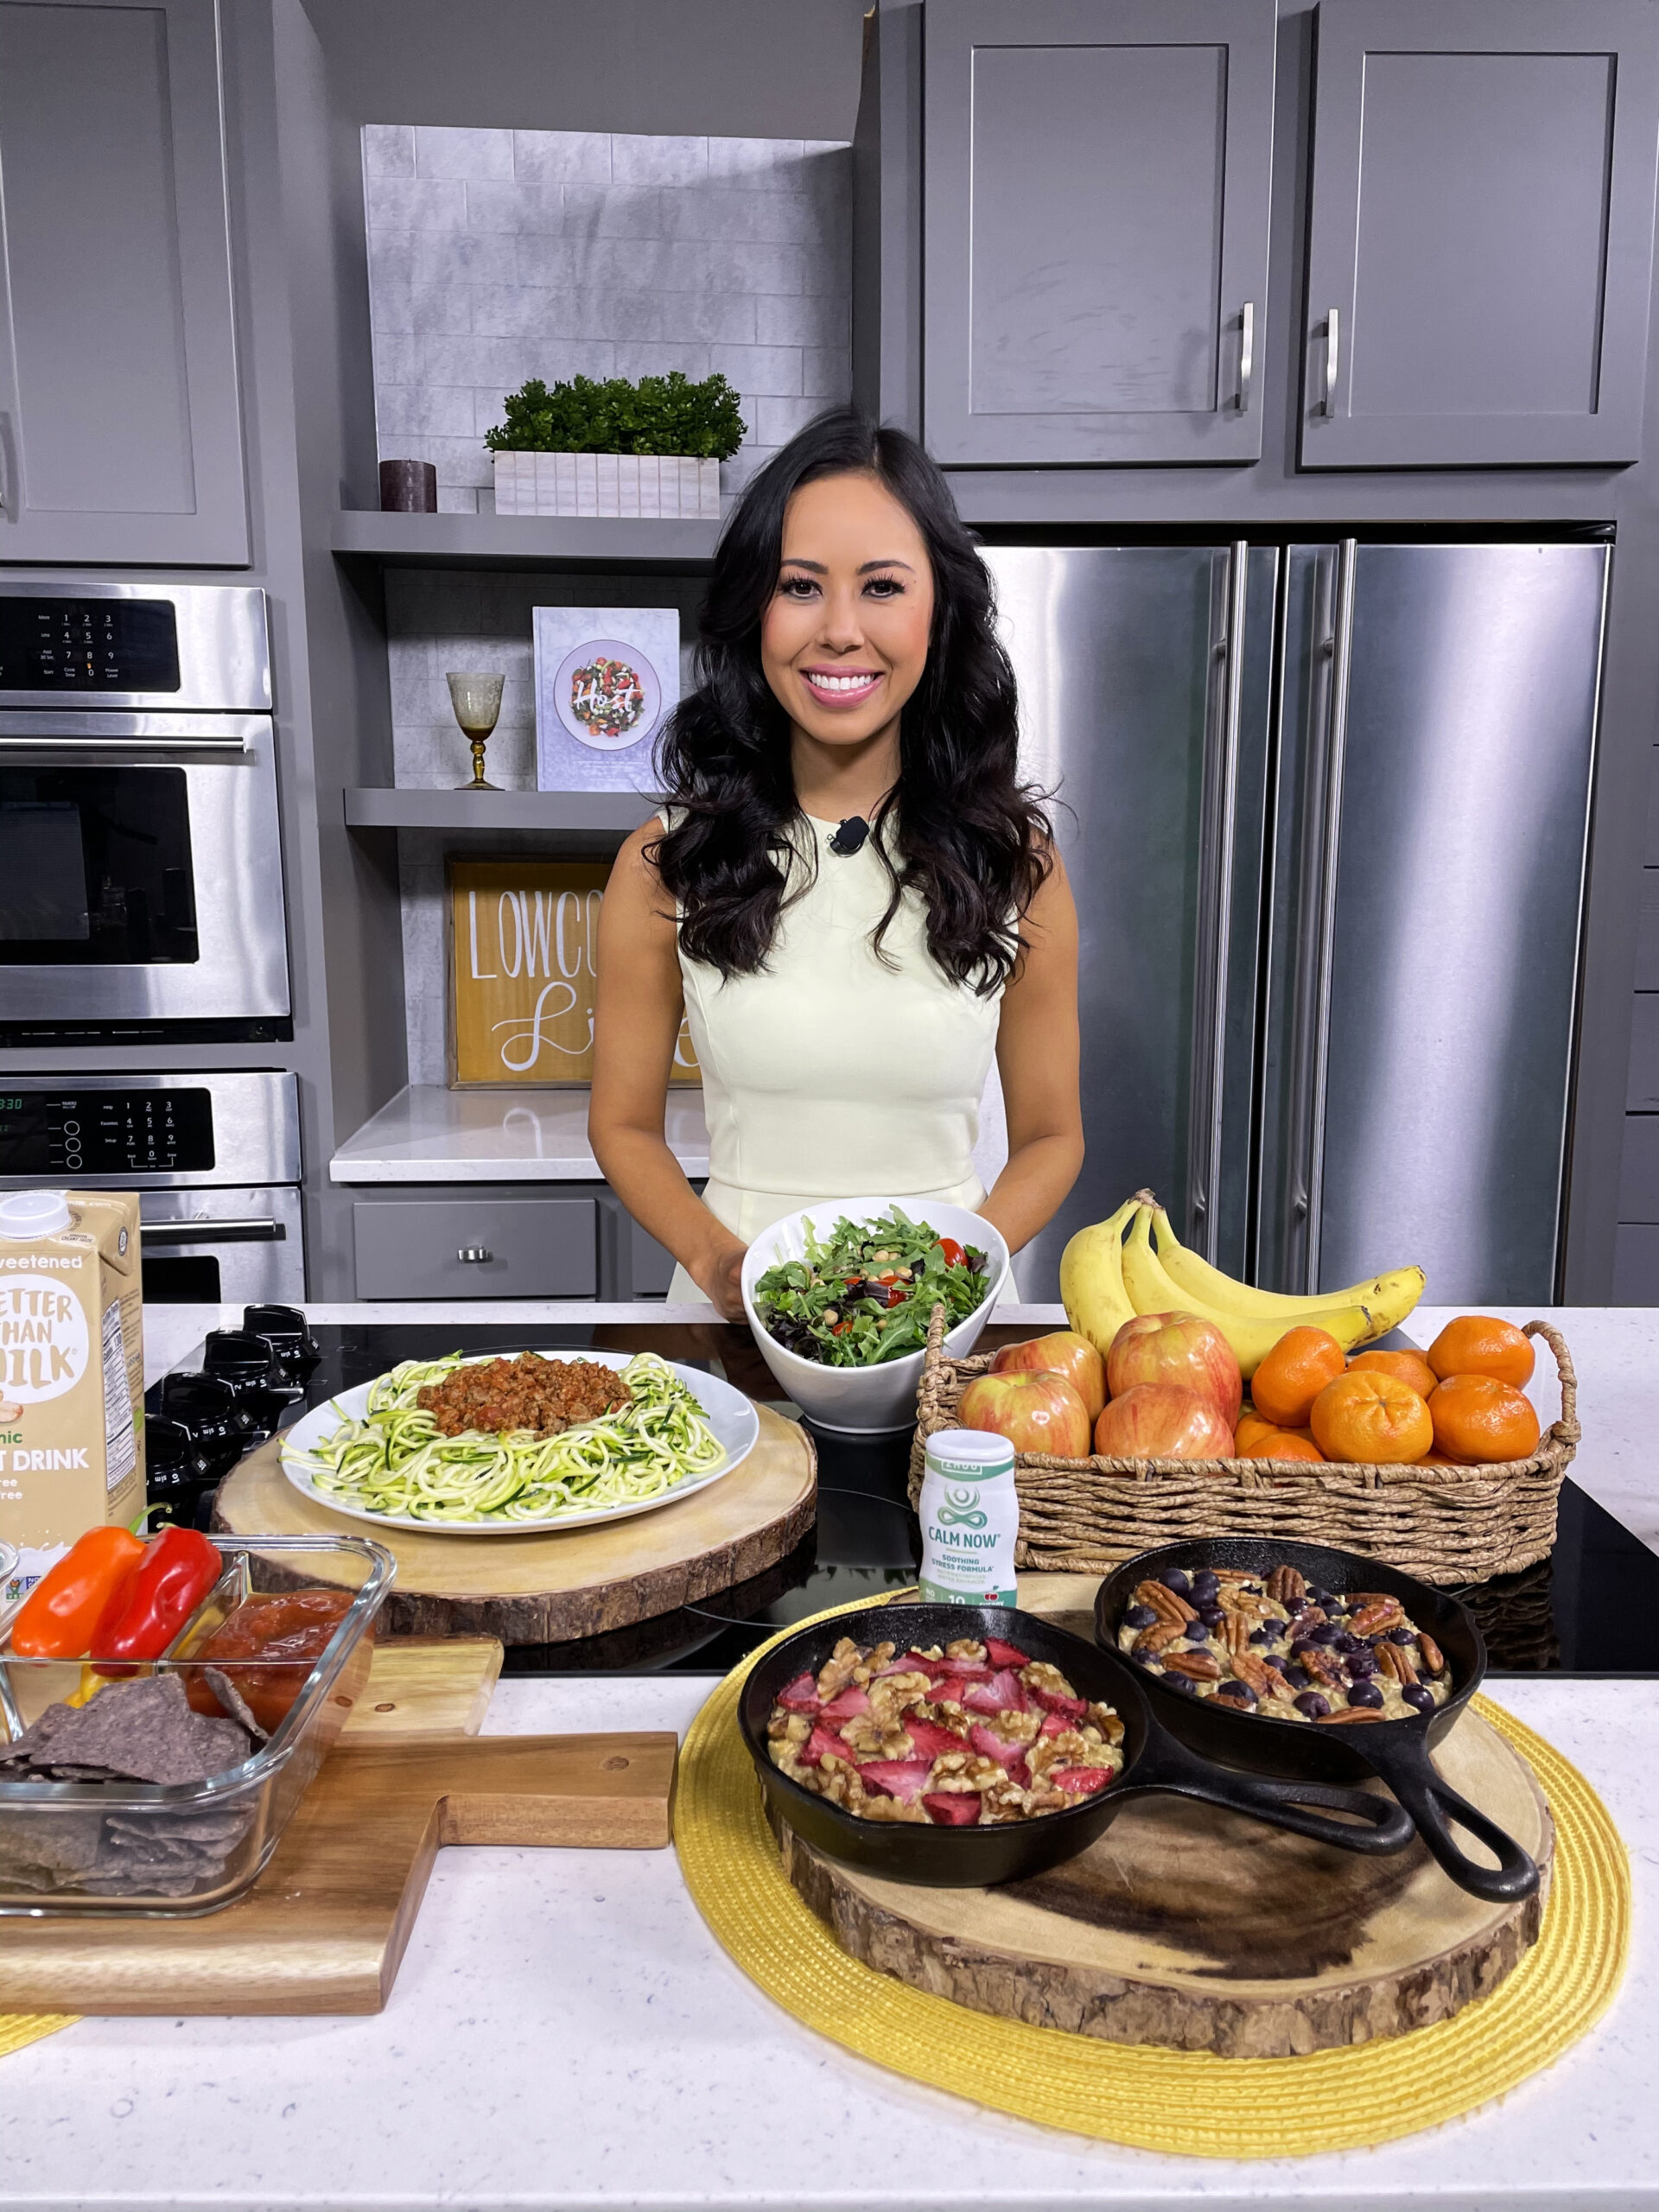 Fresh Cravings Salsa, Lumen.me, Zhou Nutrition, Better Than Milk